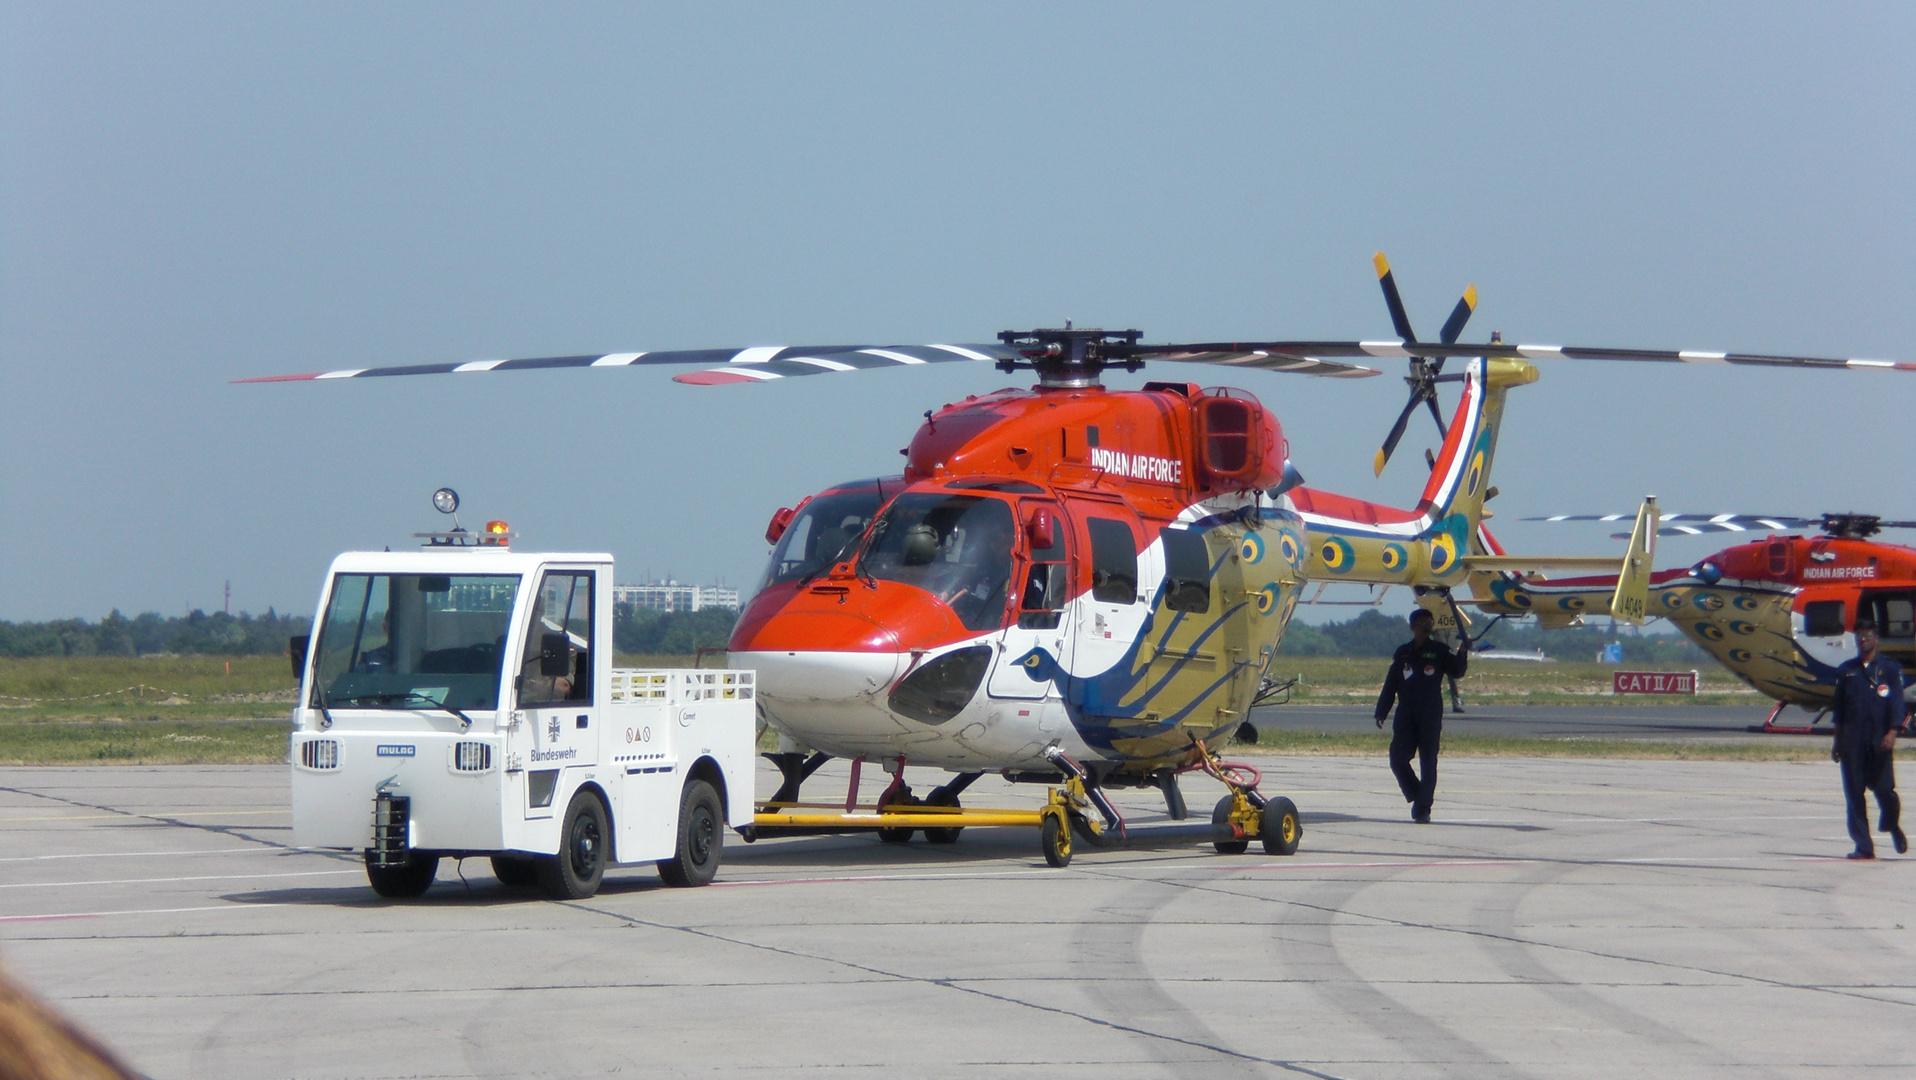 MBB Bo-117